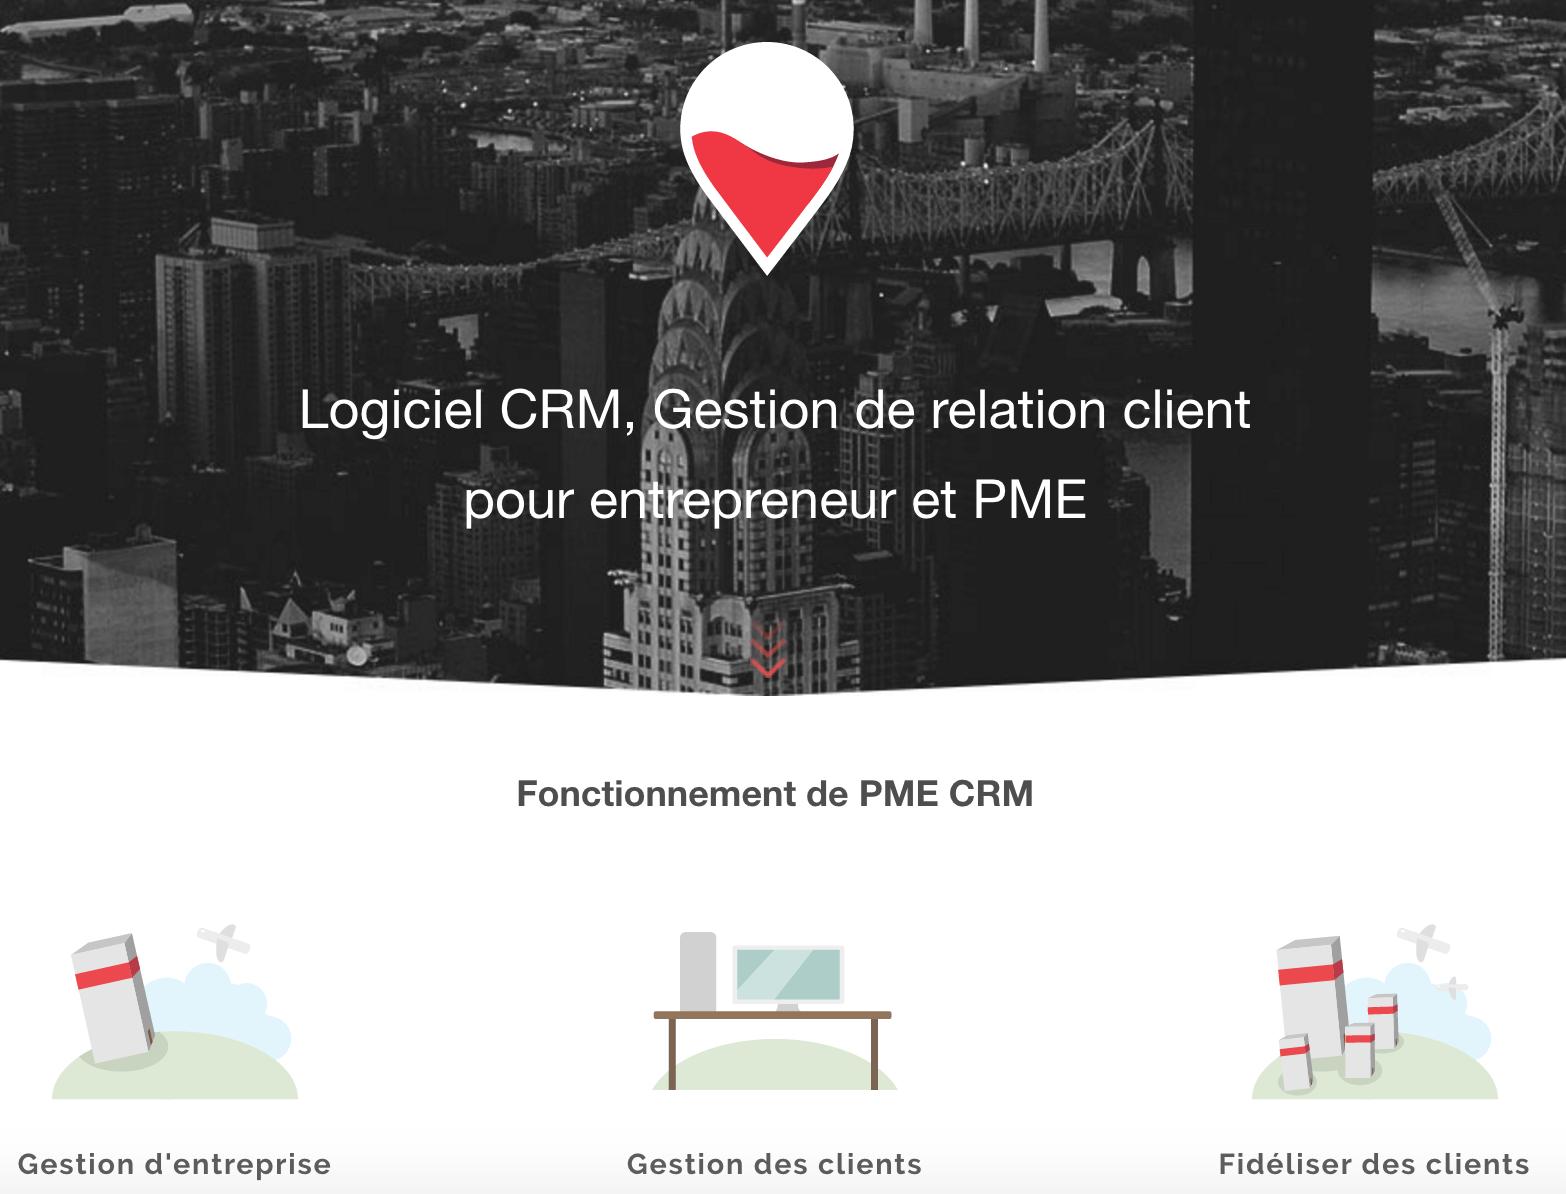 PME CRM